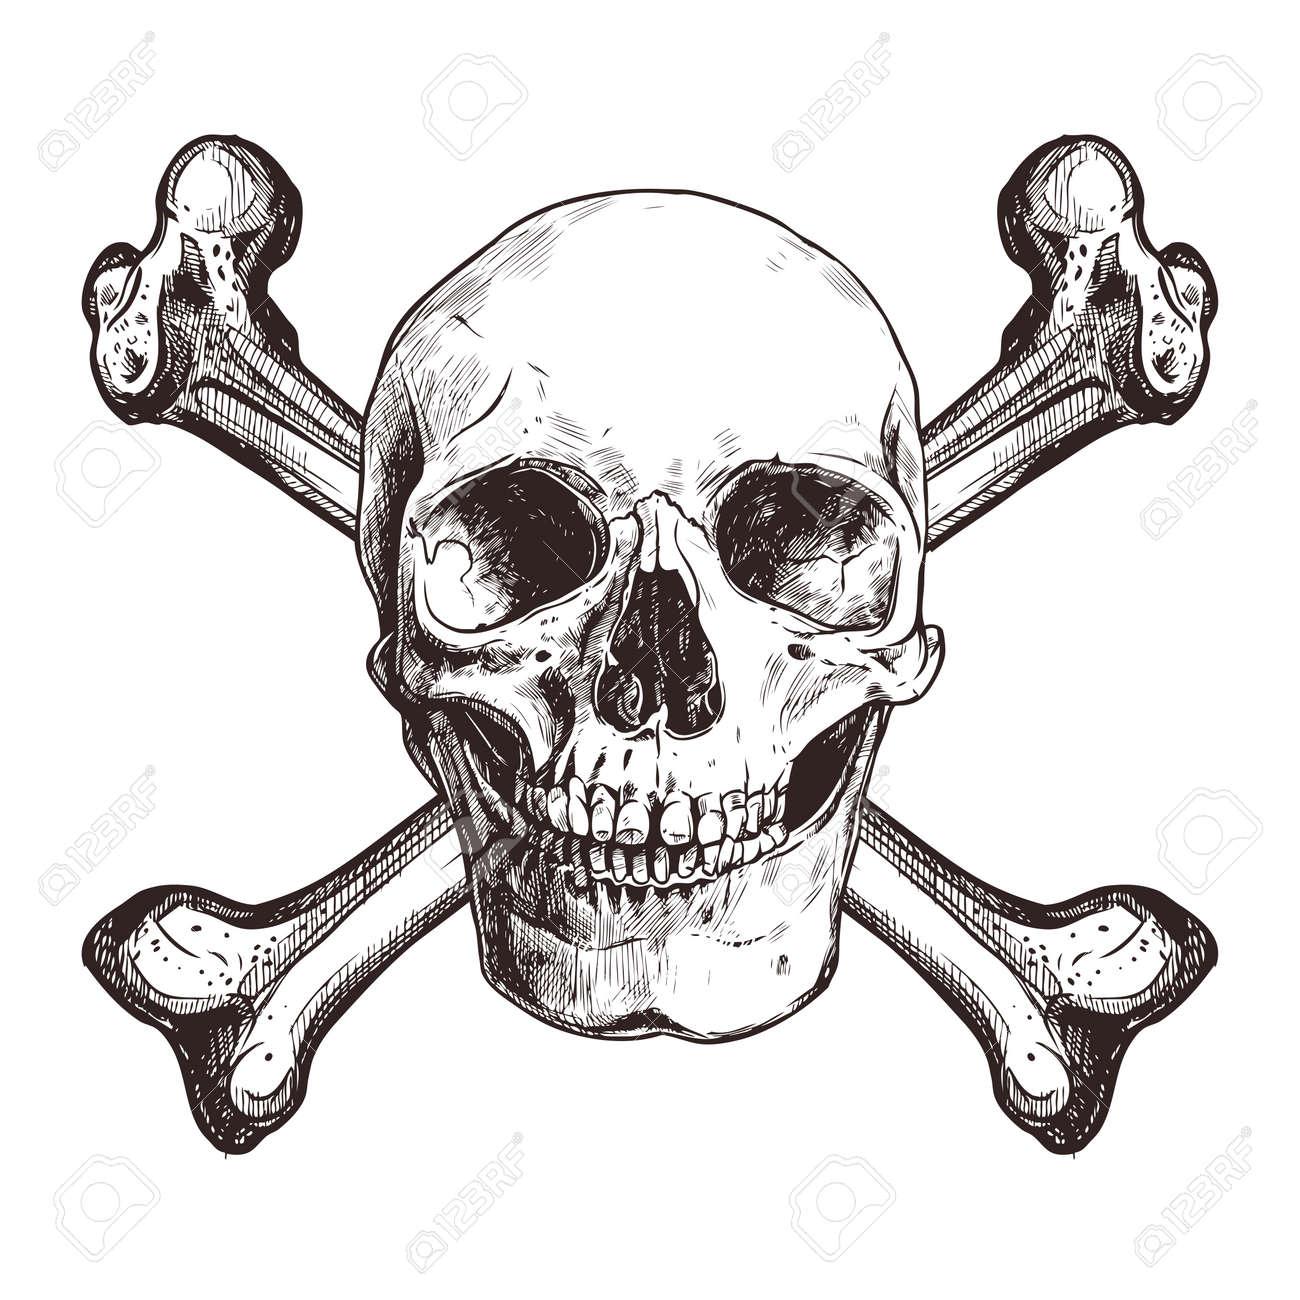 Skull With Two Cross Bones - 100603668